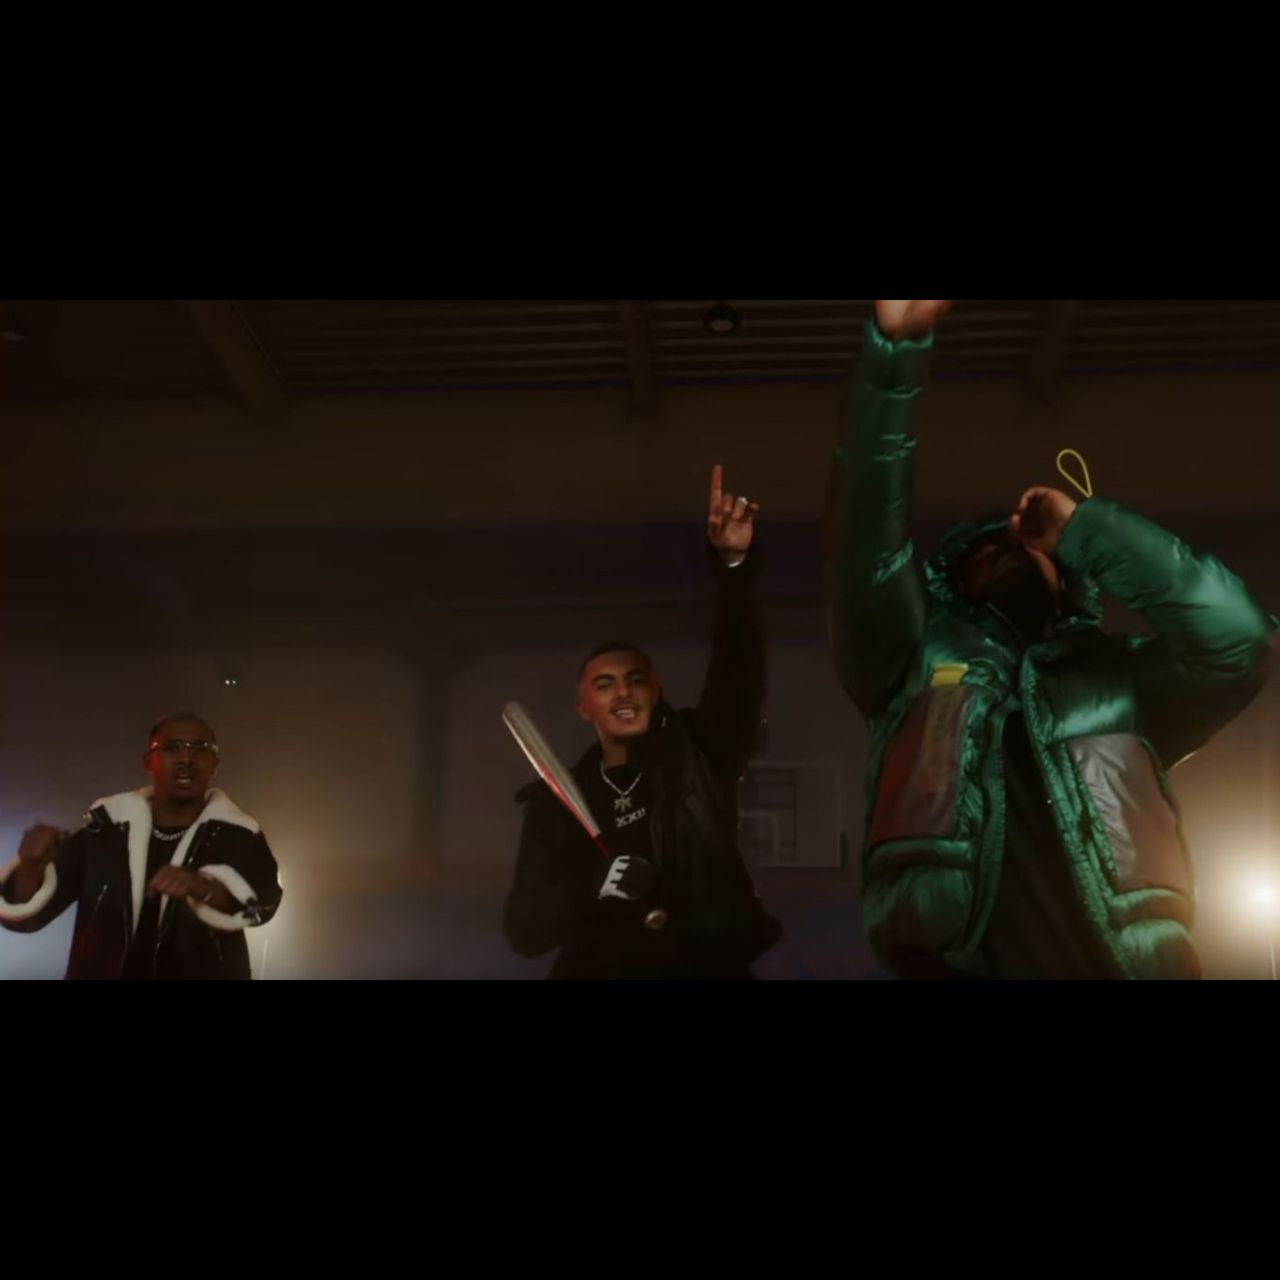 RK - Billie Jean (Remix) (ft Timal and Alonzo) (Thumbnail)